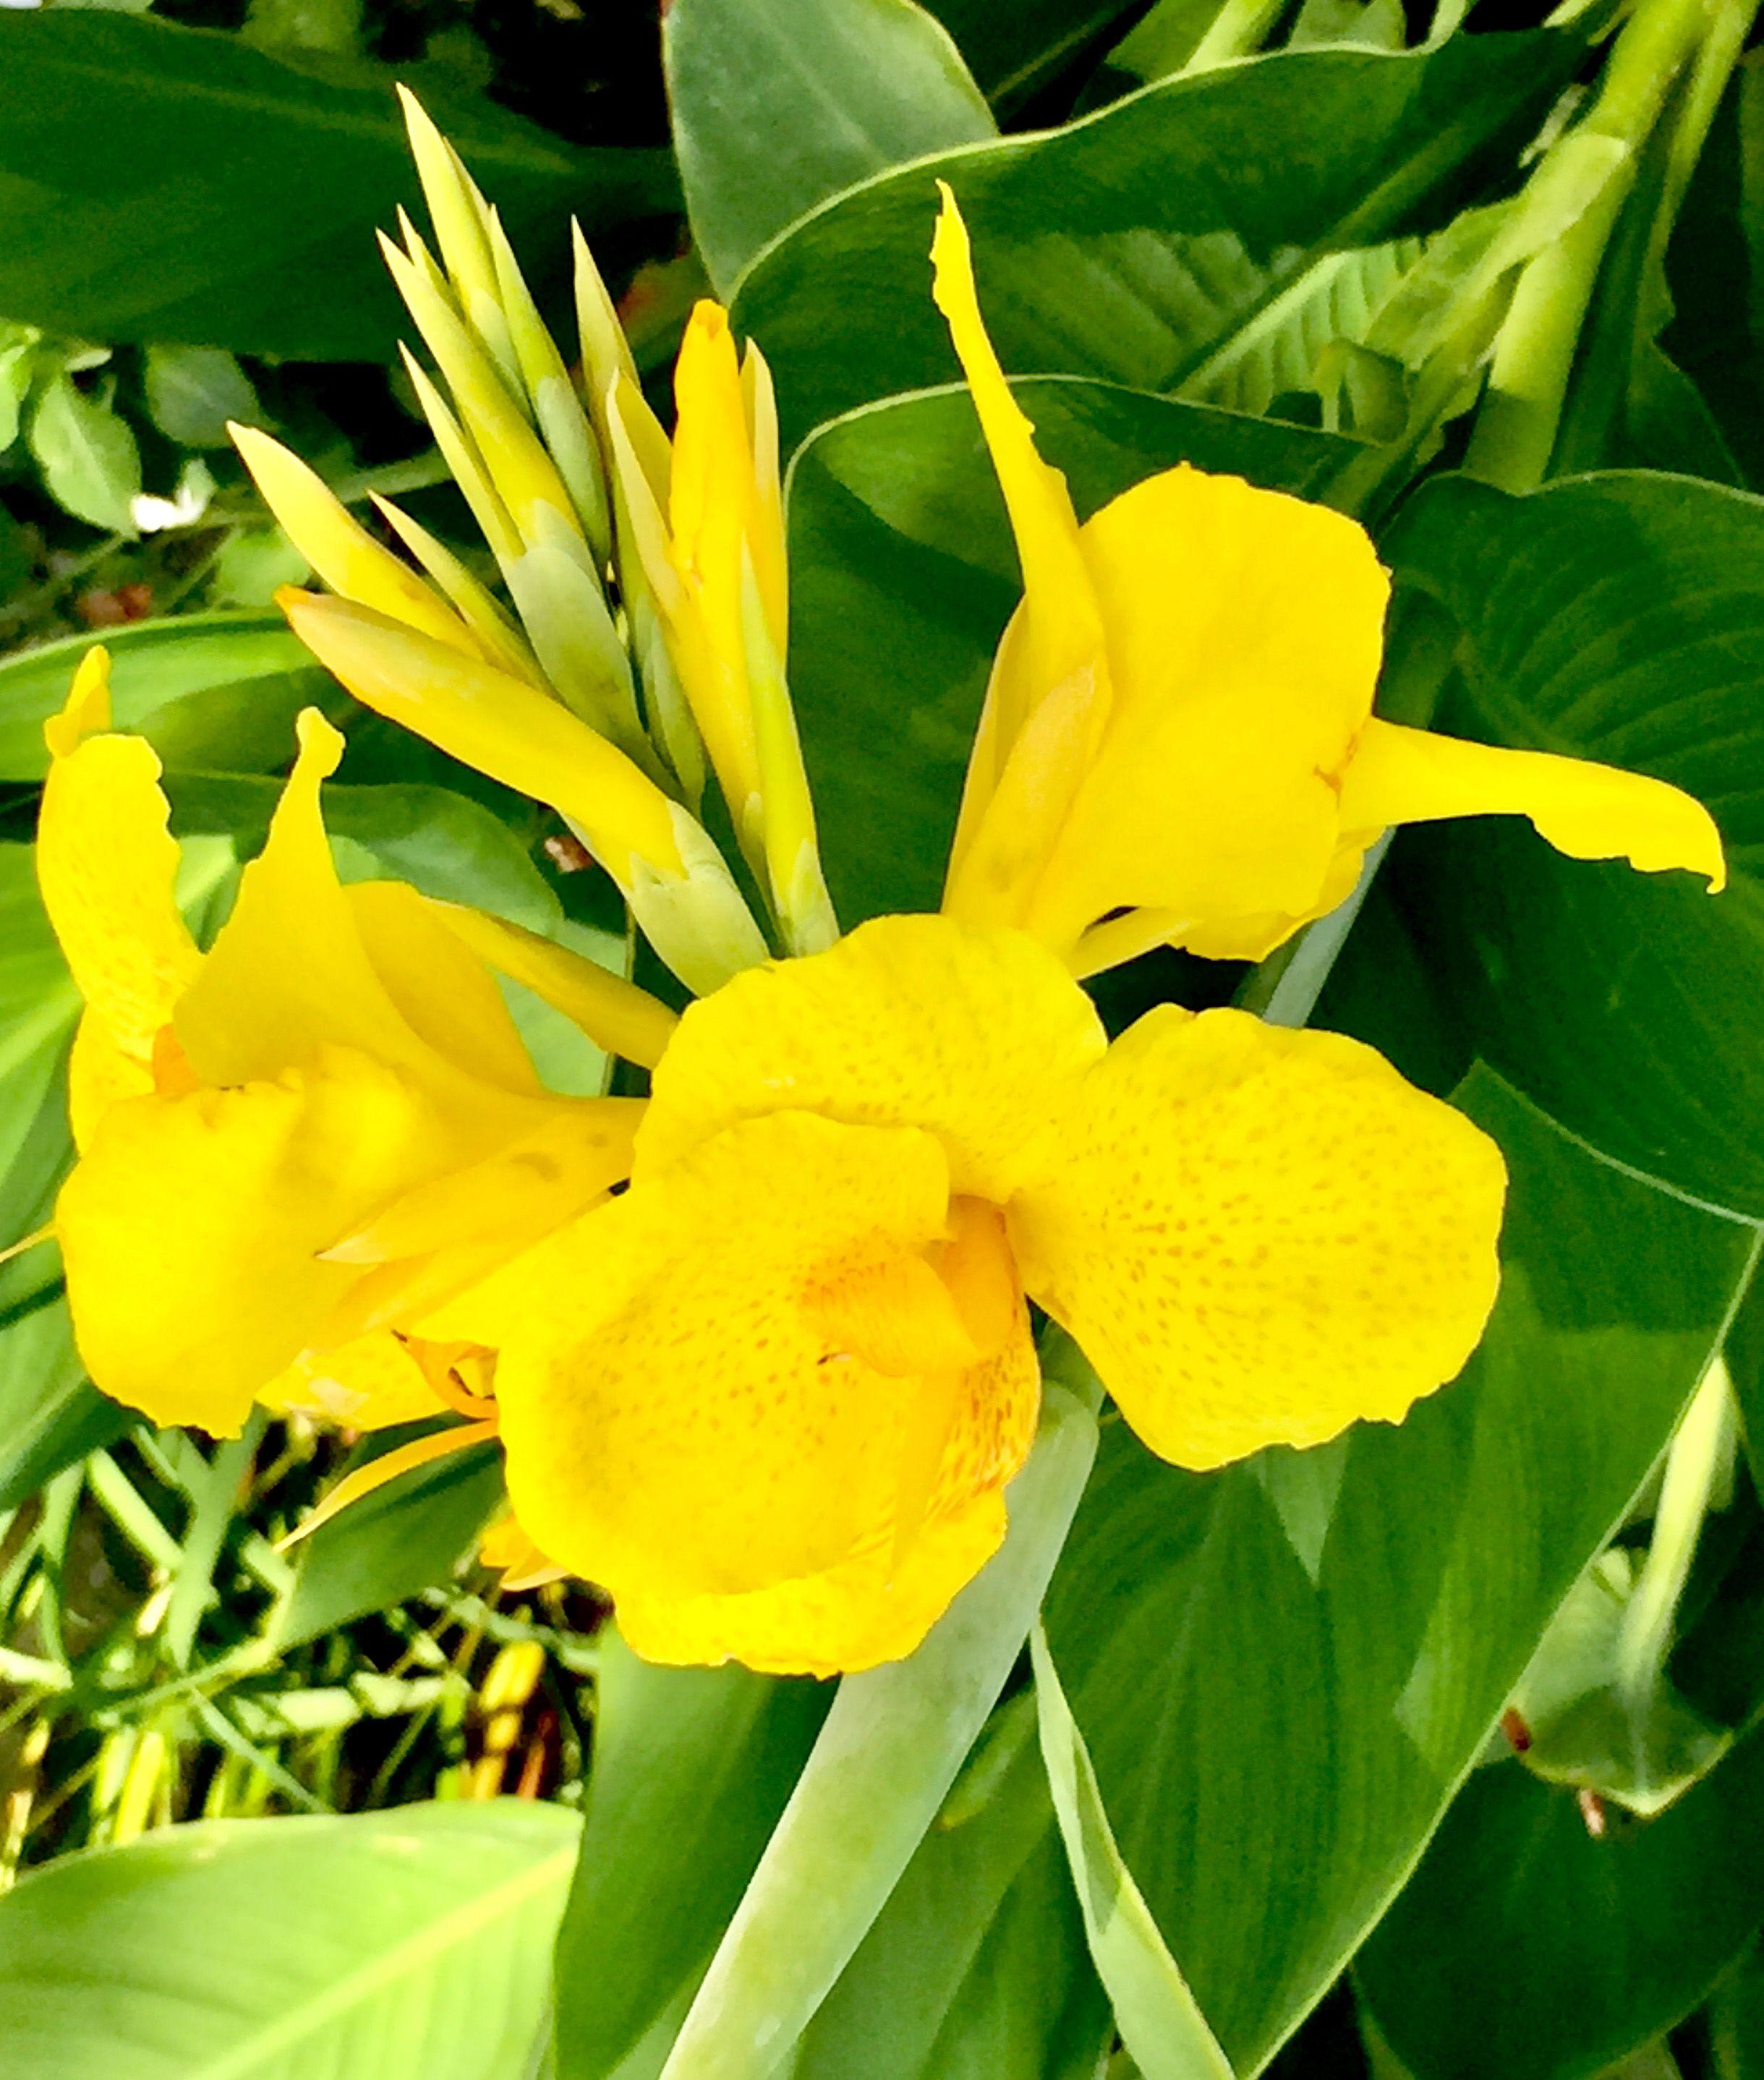 Fiori Gialli Da Giardino.Yellow Flowers Canna Indica Gialla Fiori Giardino